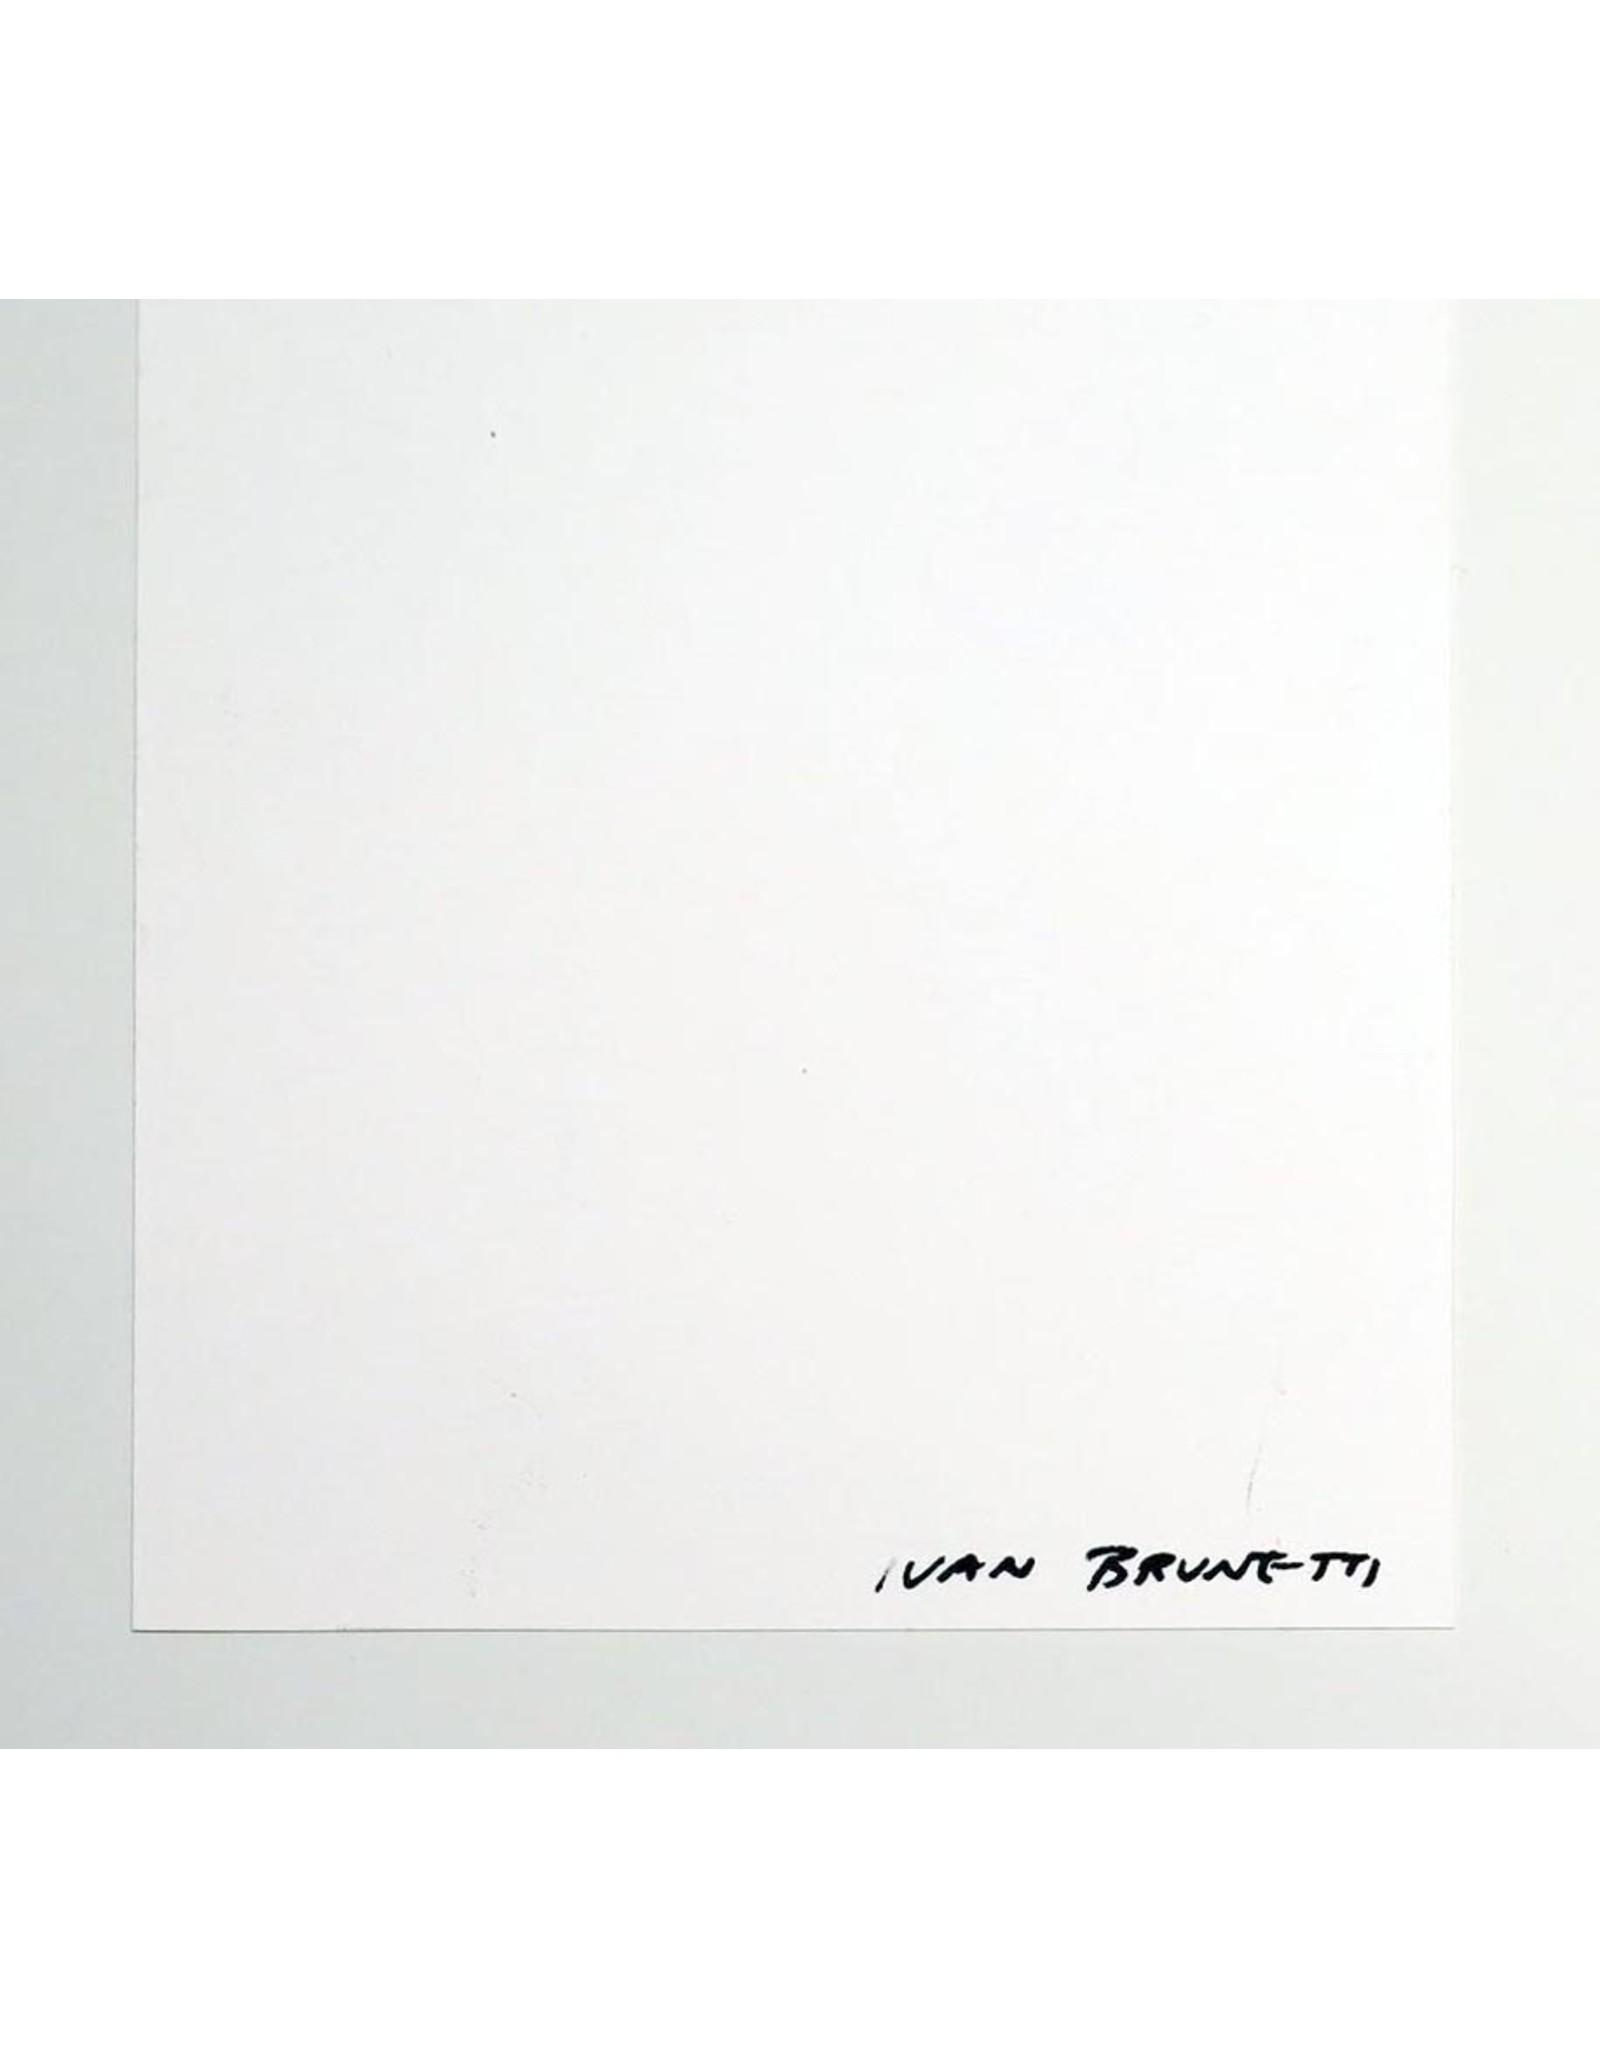 Ivan Brunetti Princess, 2014, Illustration by Ivan Brunetti